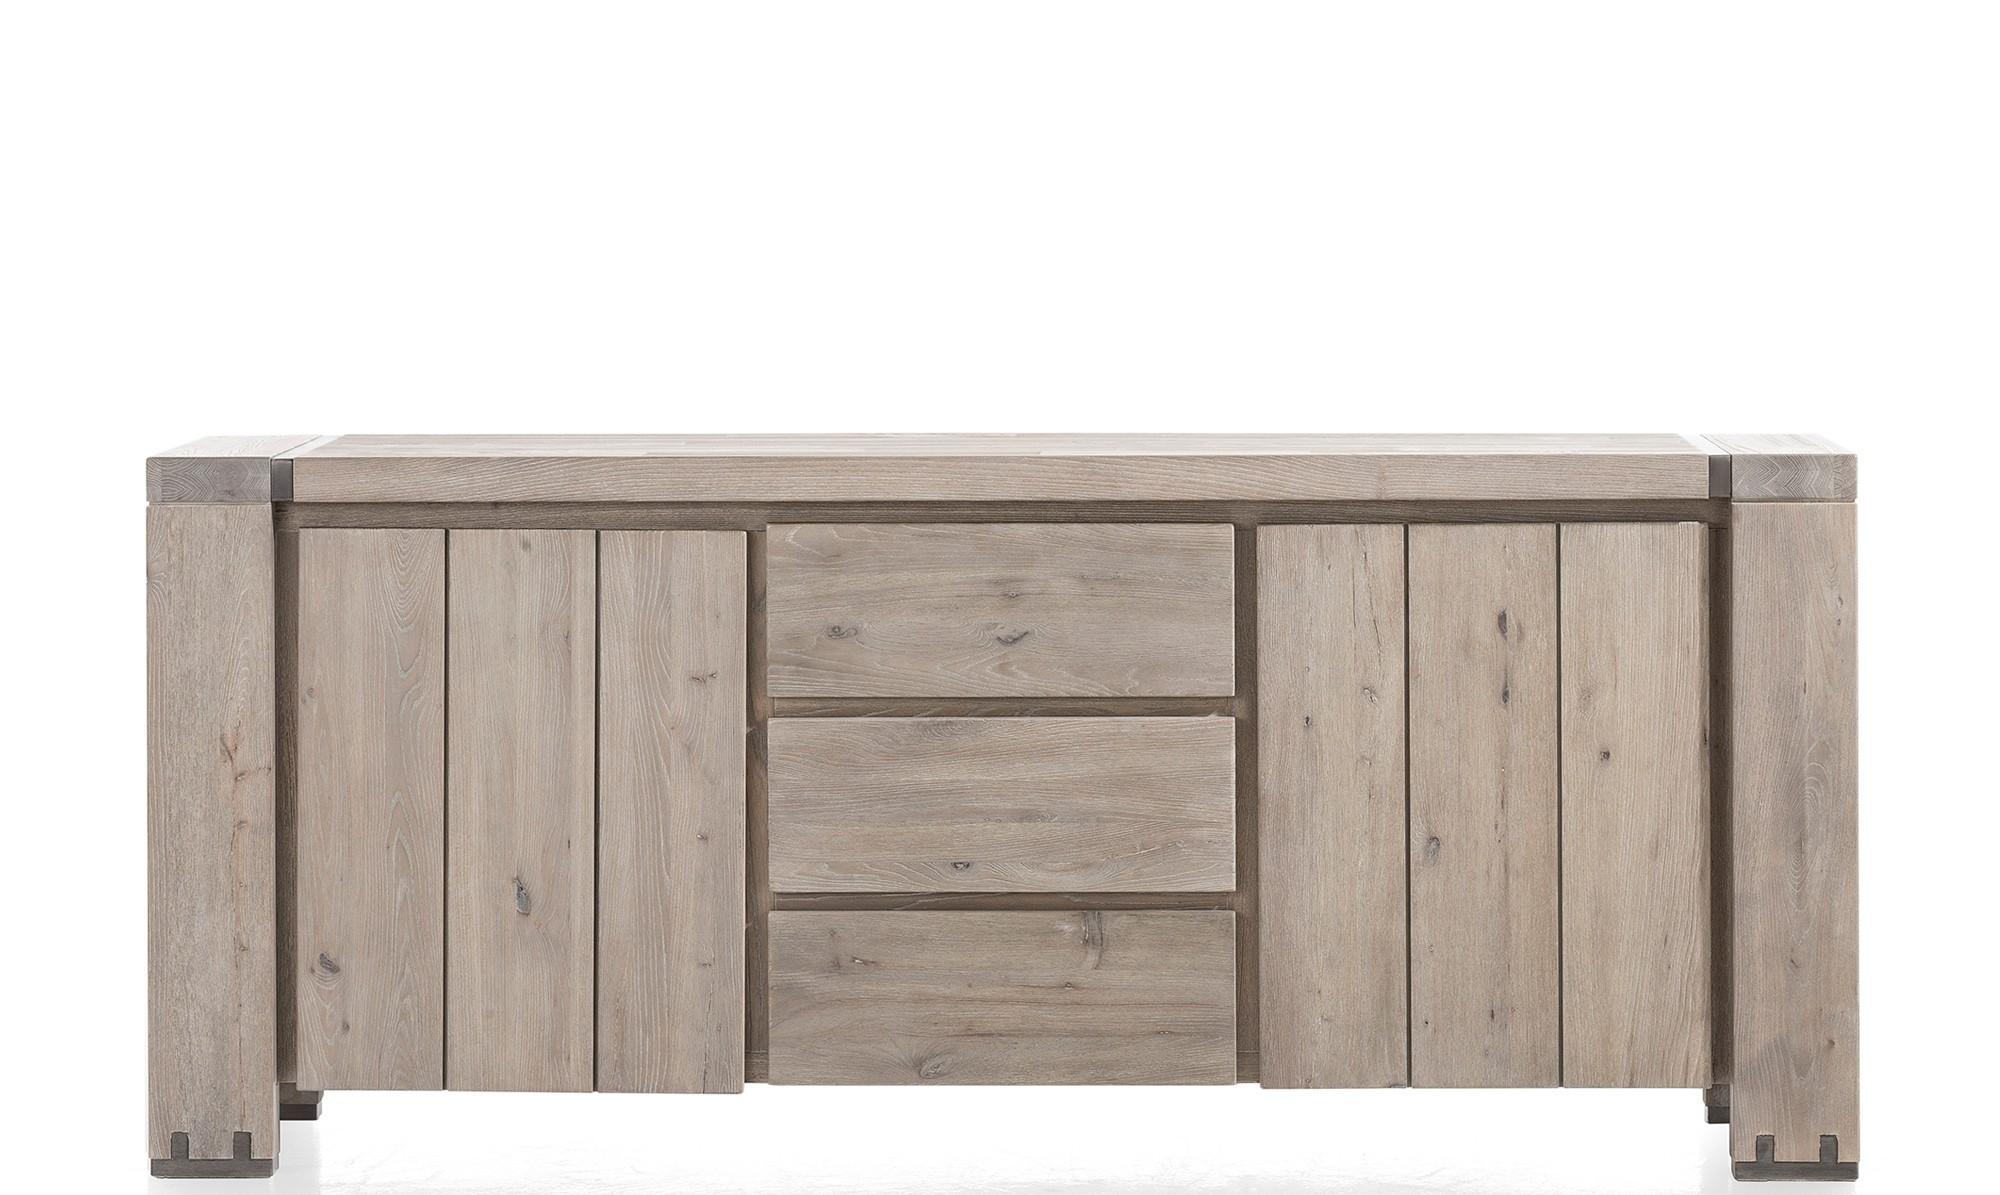 Sideboards - Modern, Oak & Pine Sideboards - Fishpools regarding 3-Drawer/2-Door White Wash Sideboards (Image 22 of 30)